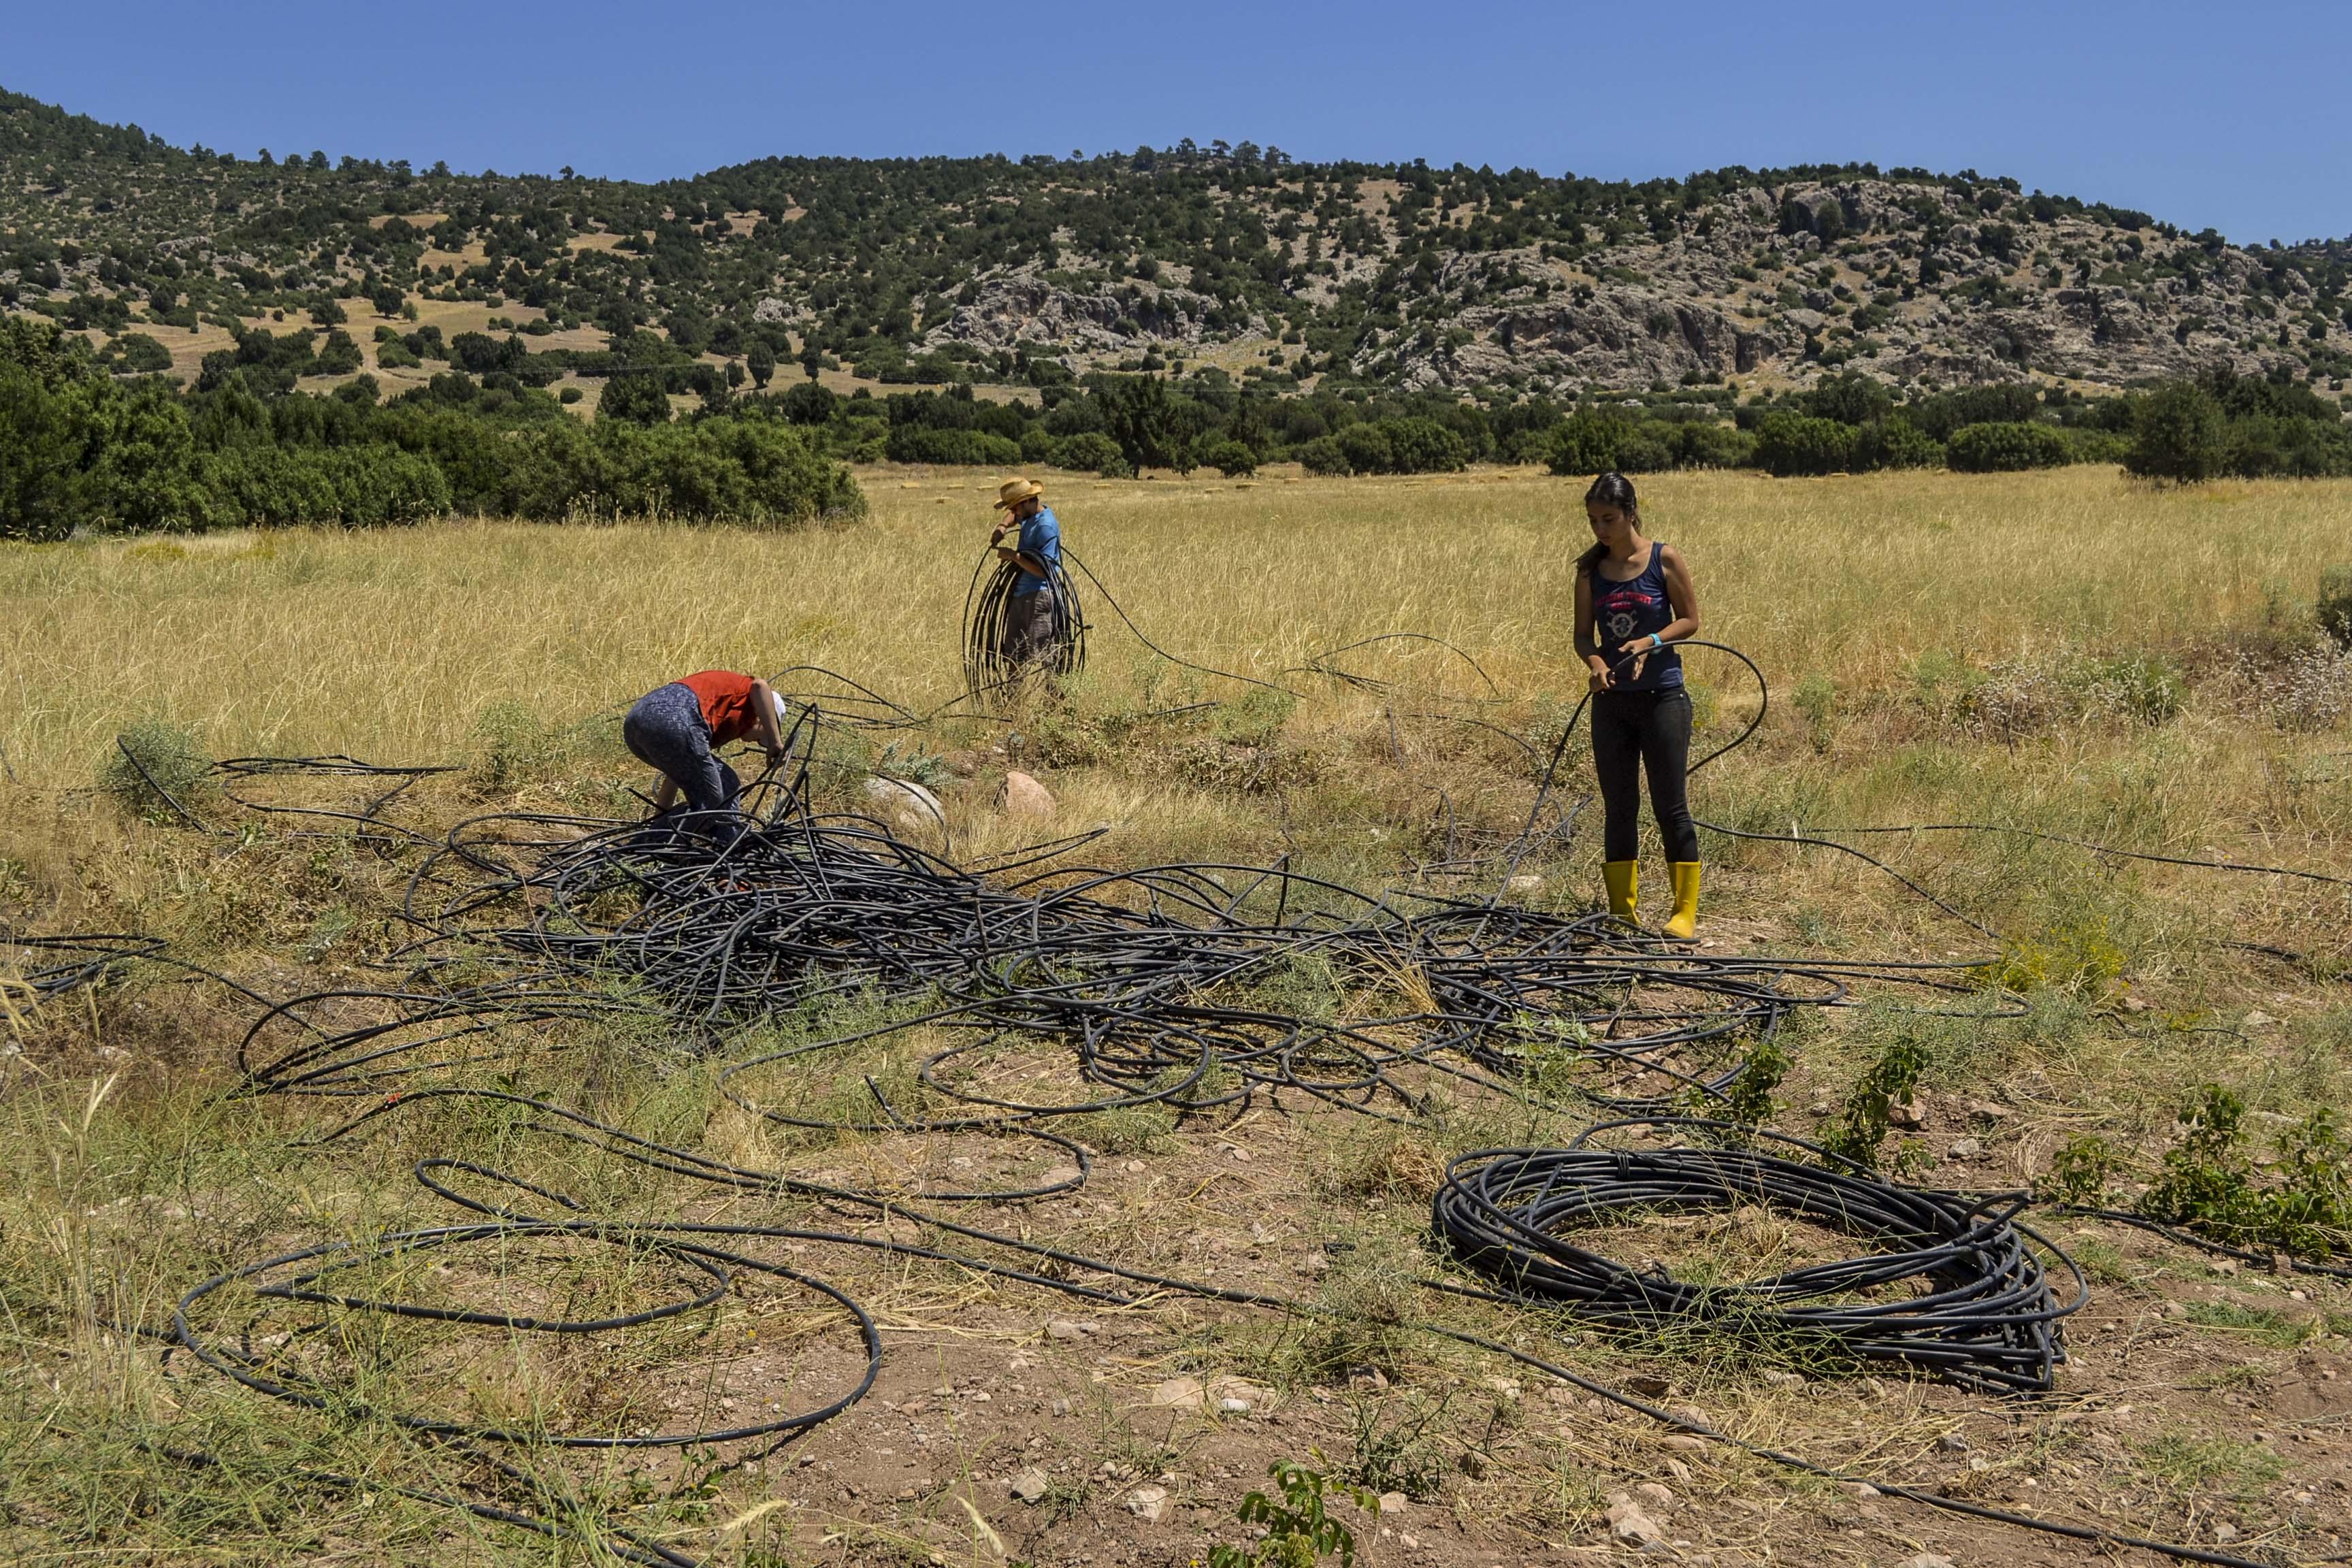 Setting up irrigation system